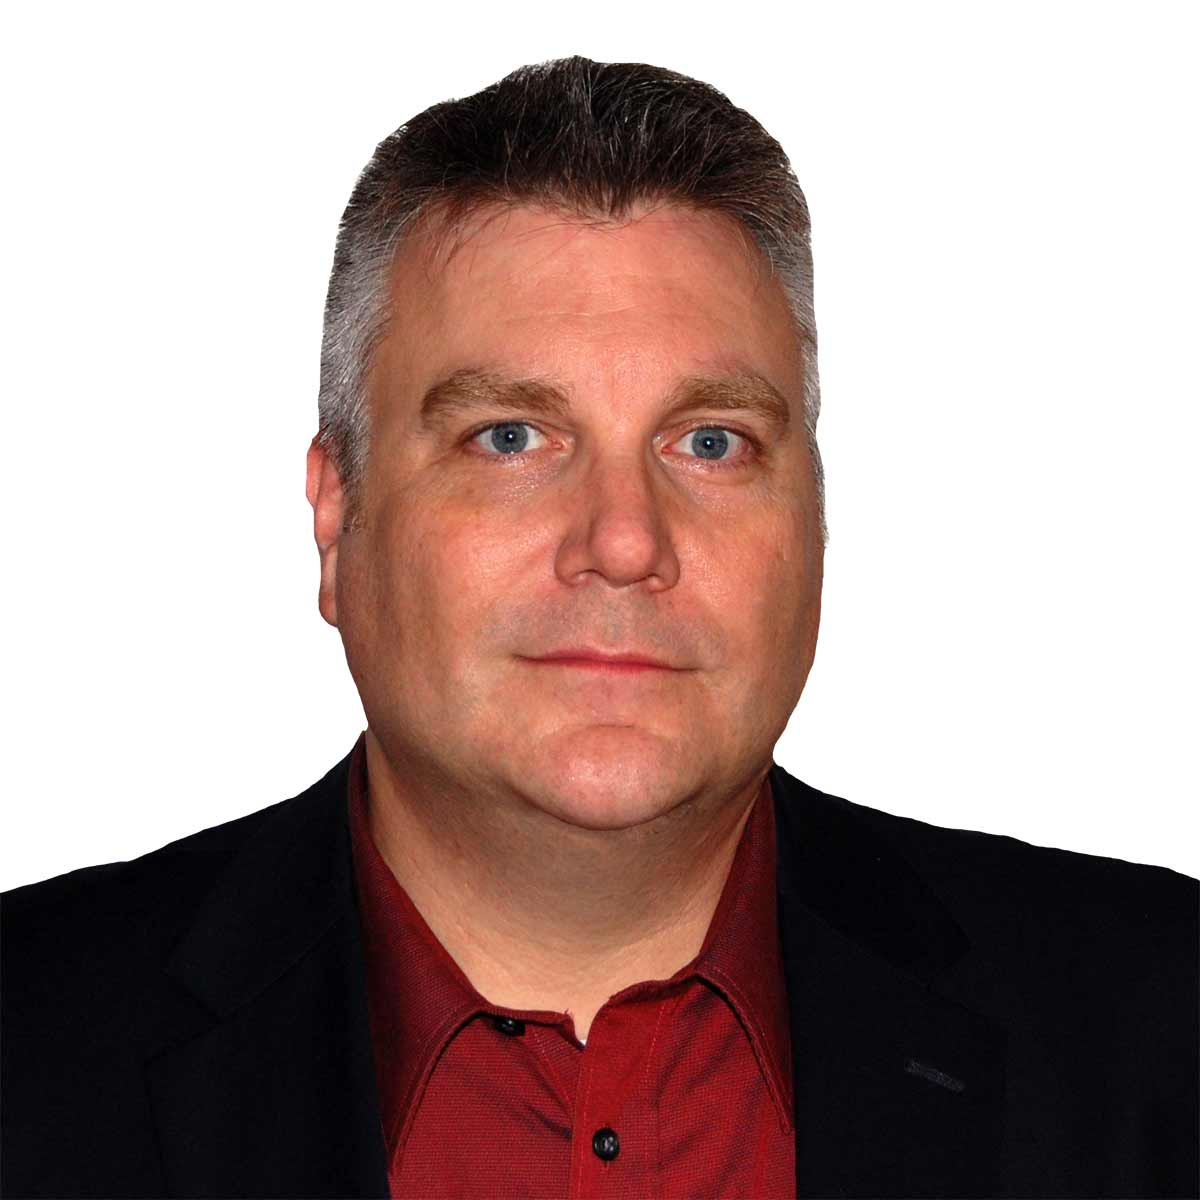 Roland Reinhart: Digital Marketing, Website Management, Search Engine Optimization, Search Engine Advertising Expert